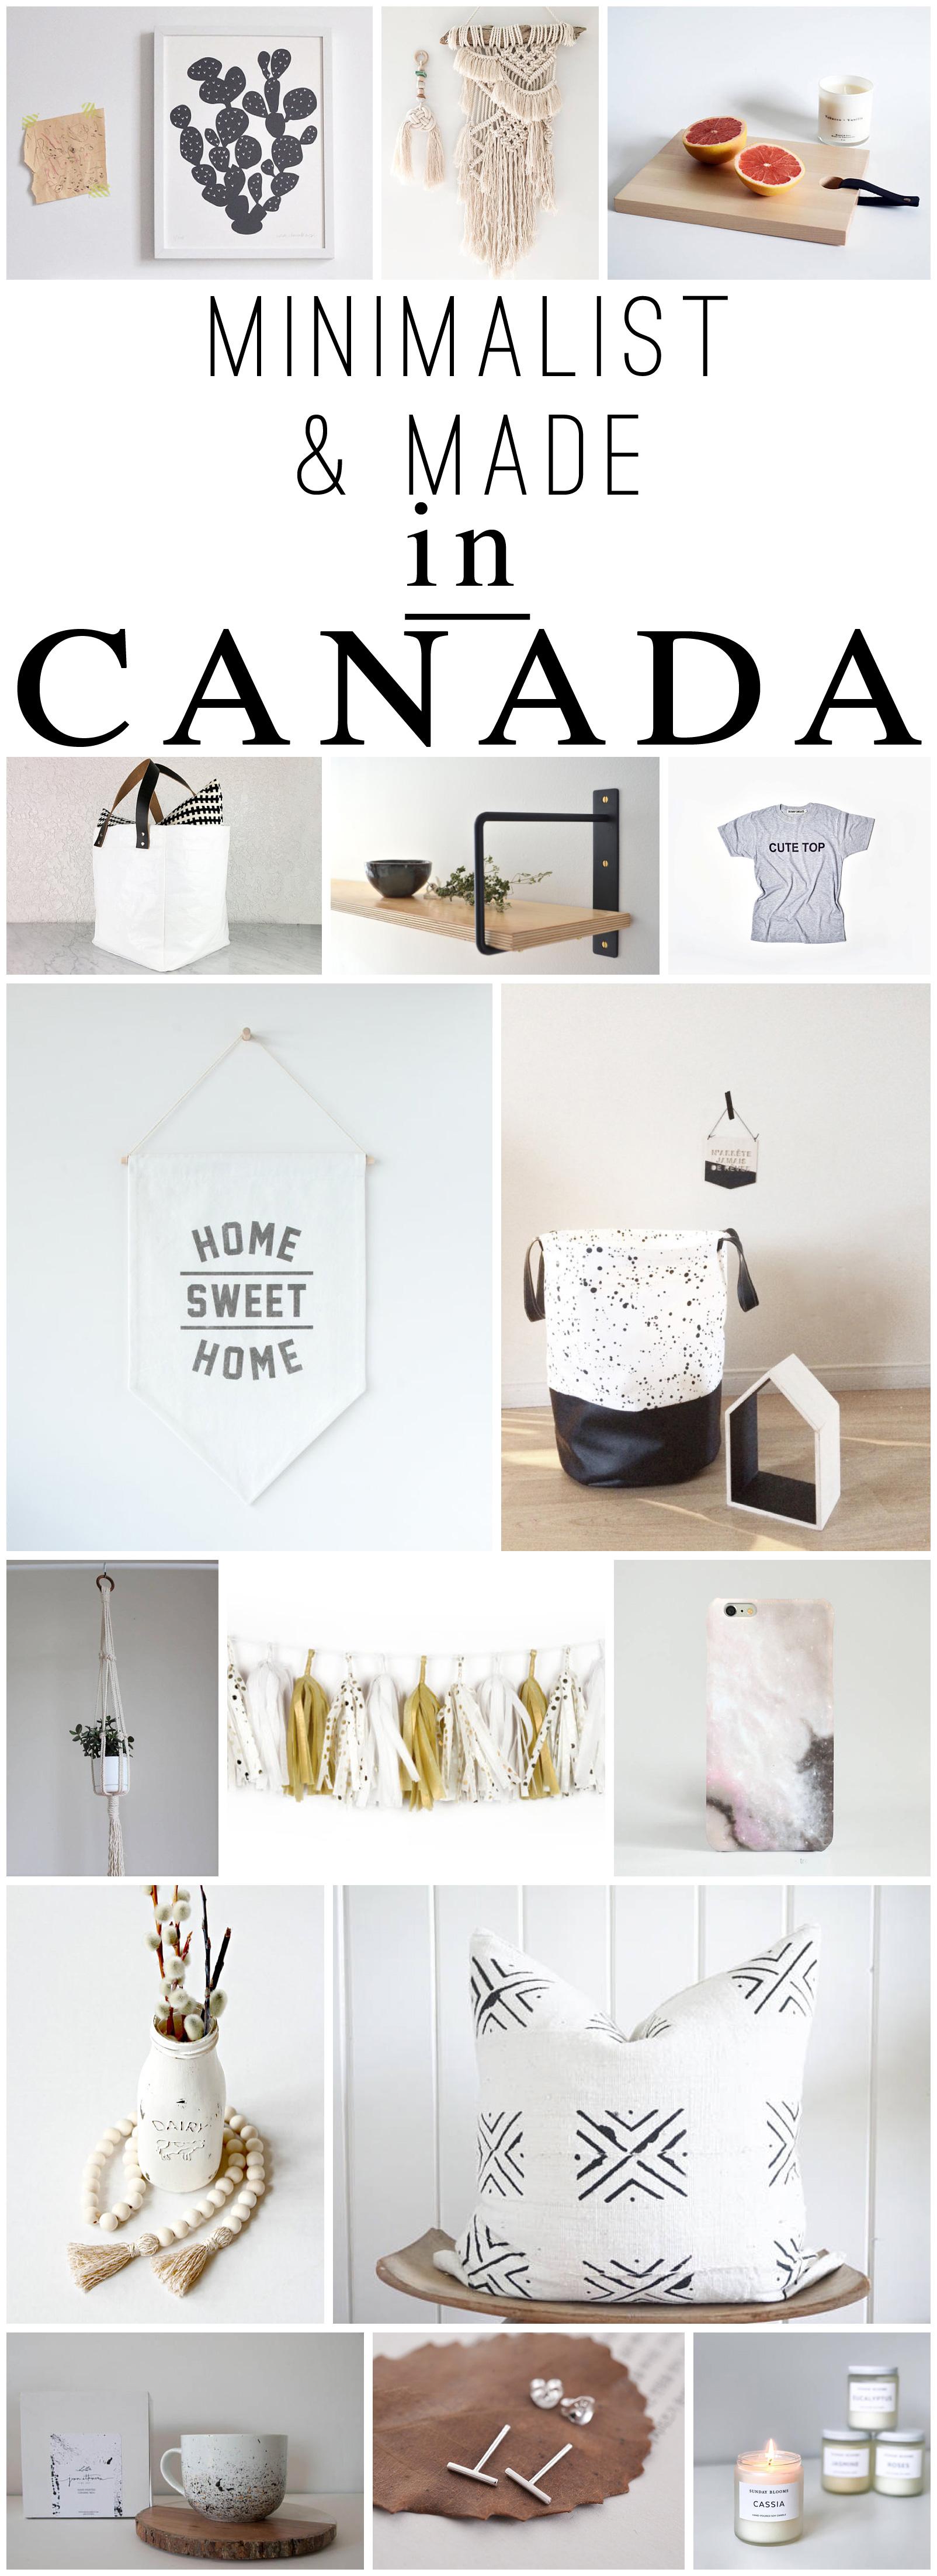 Etsy minimalist decor items: cactus print, macrame art, laundry bag, shelf, tissue paper tassels, pillows and more. #decor